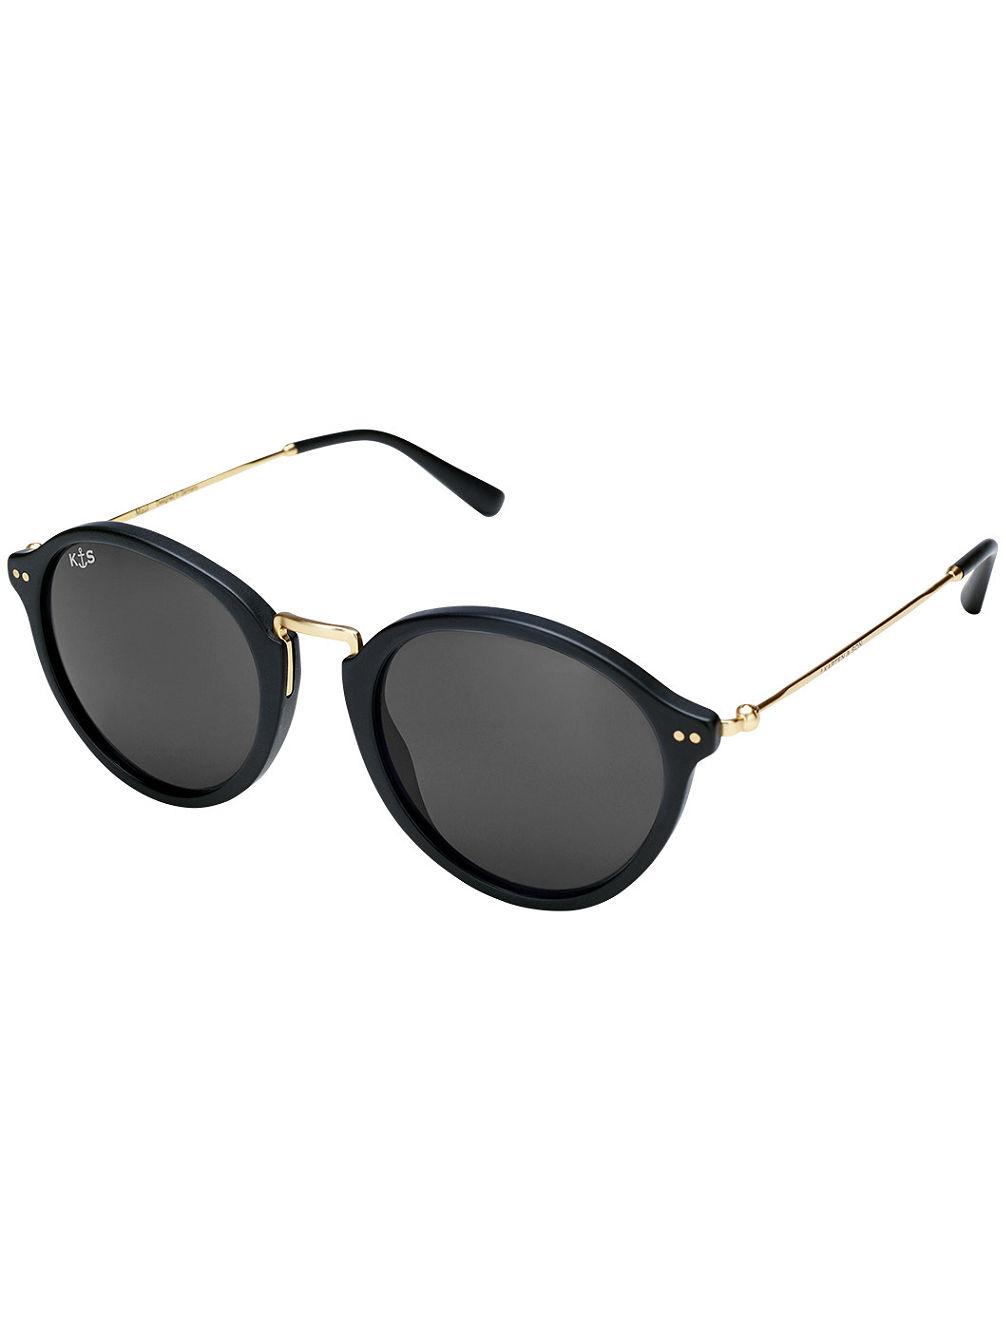 kapten son maui all black matt black sonnenbrille online kaufen bei blue. Black Bedroom Furniture Sets. Home Design Ideas